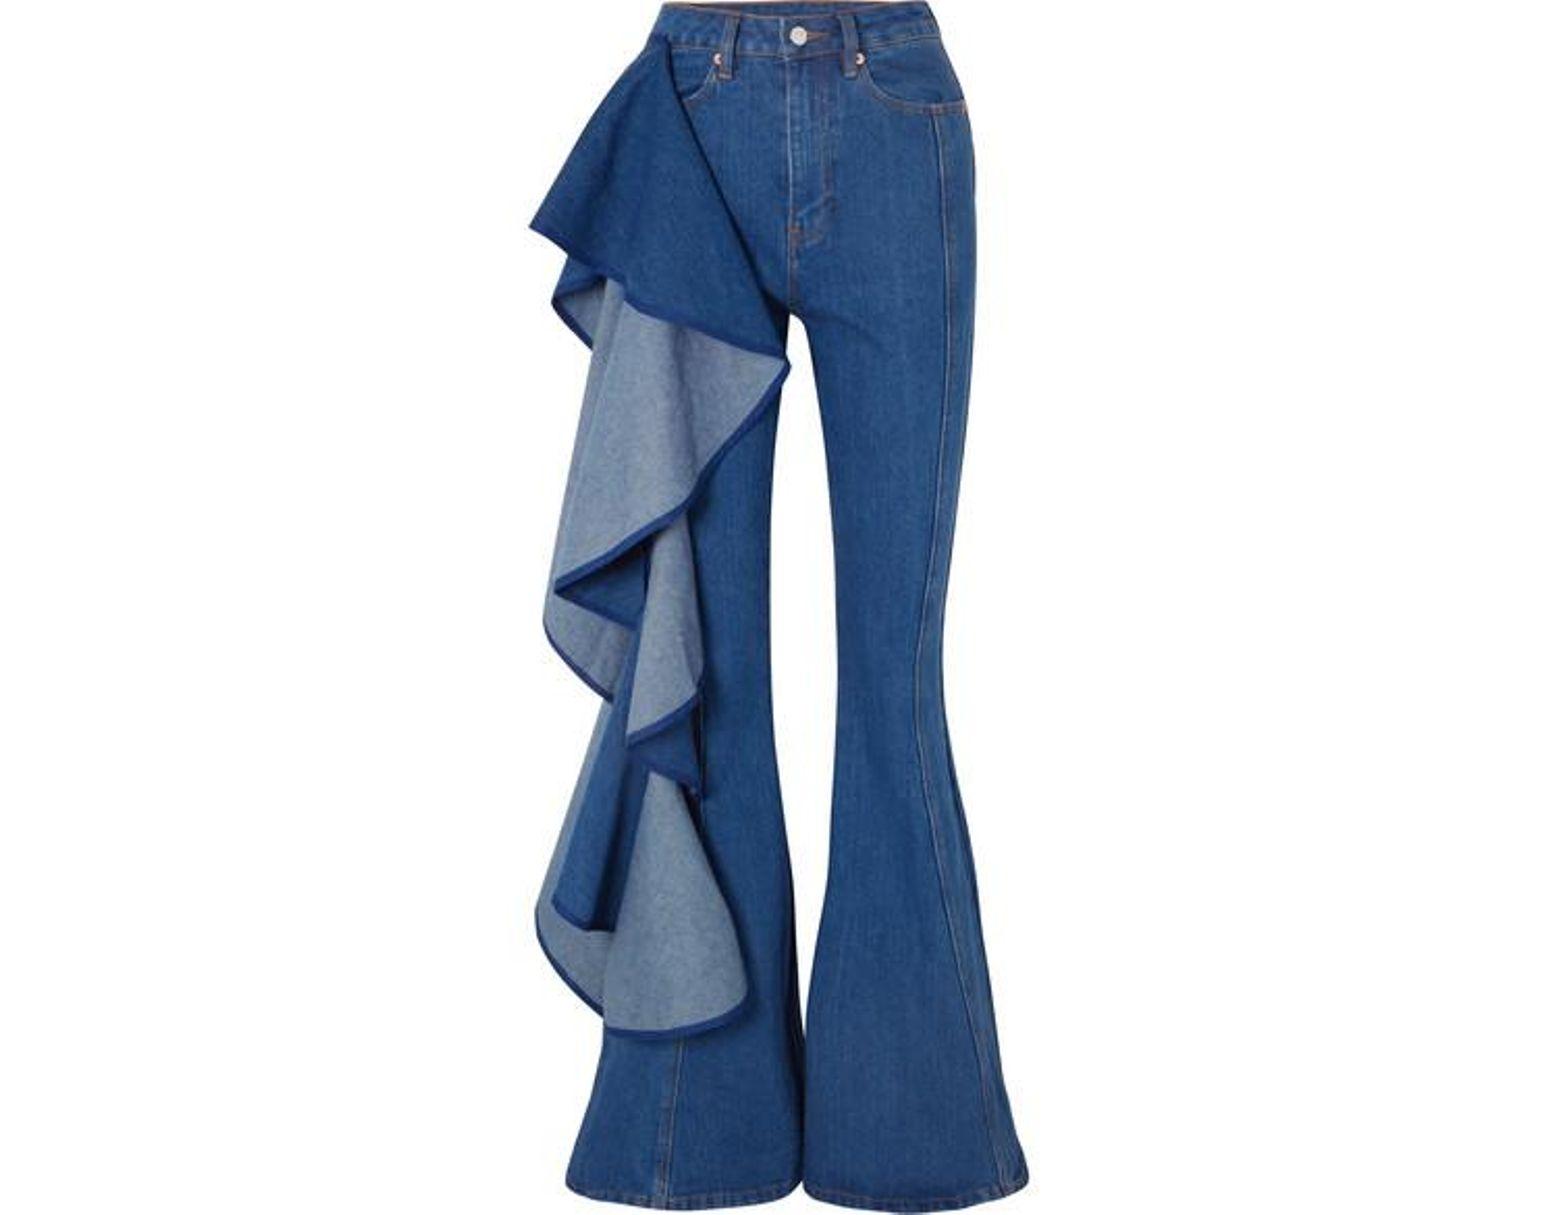 50dd013dacb25b Solace London Trumpet Ruffled High-rise Wide-leg Jeans in Blue - Lyst